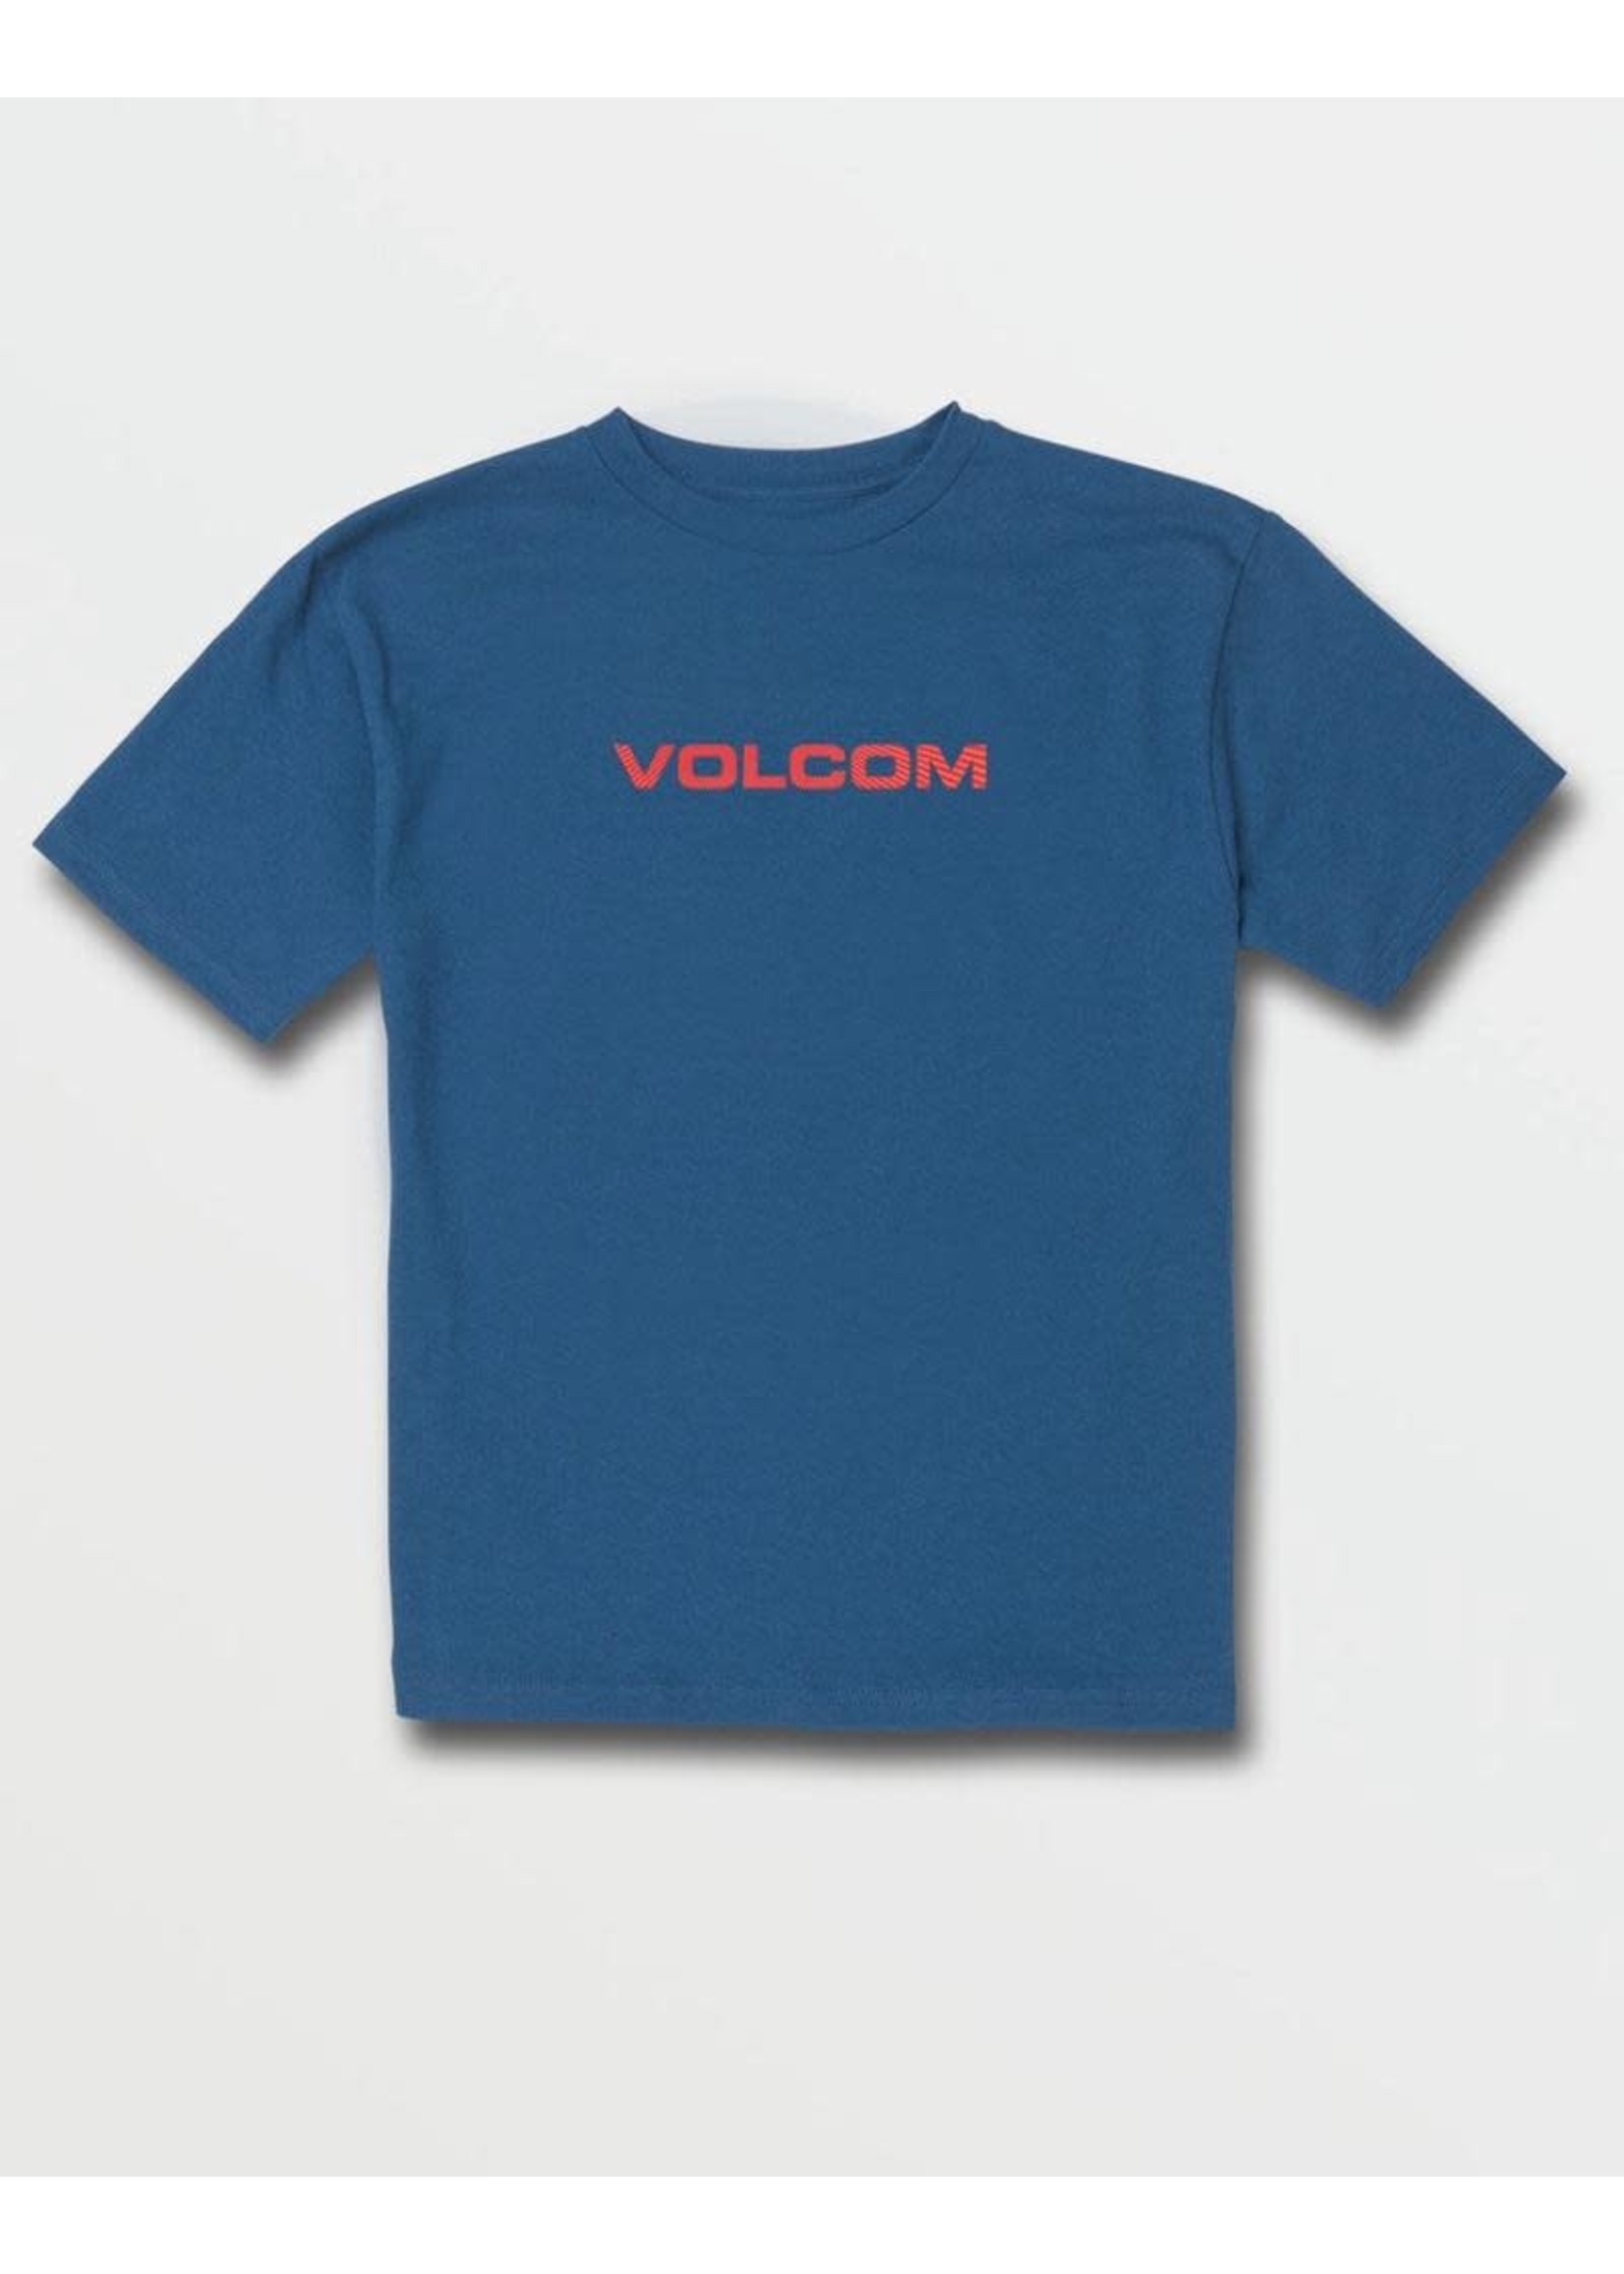 Volcom Volcom Kids, Big Boys Riz Euro XXX Balpoint Blue Short Sleeve Tee